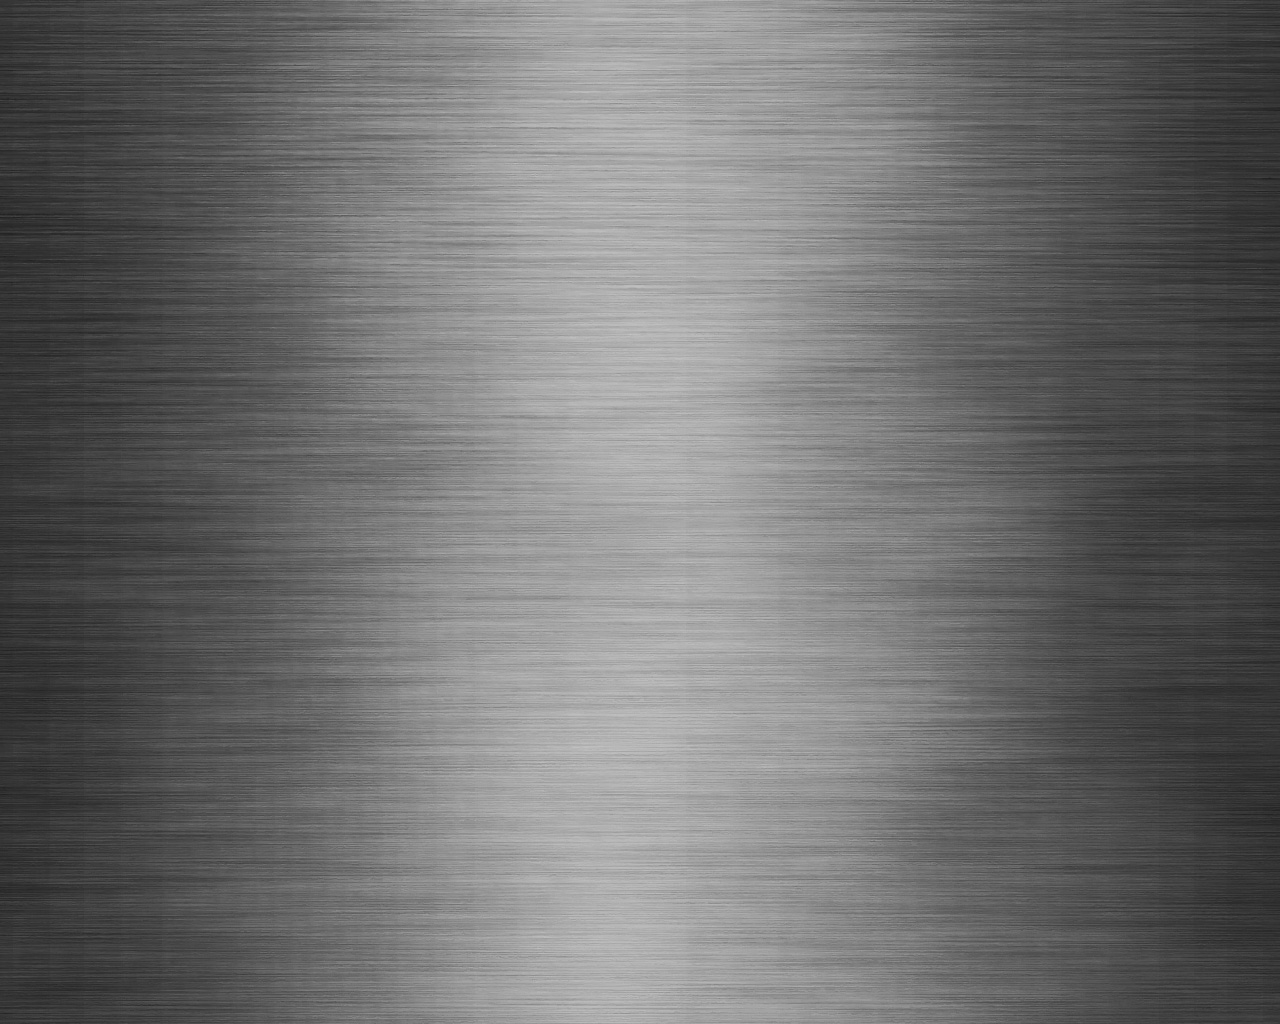 1280x1024 brushed metal desktop image   AnandTech Forums 1280x1024